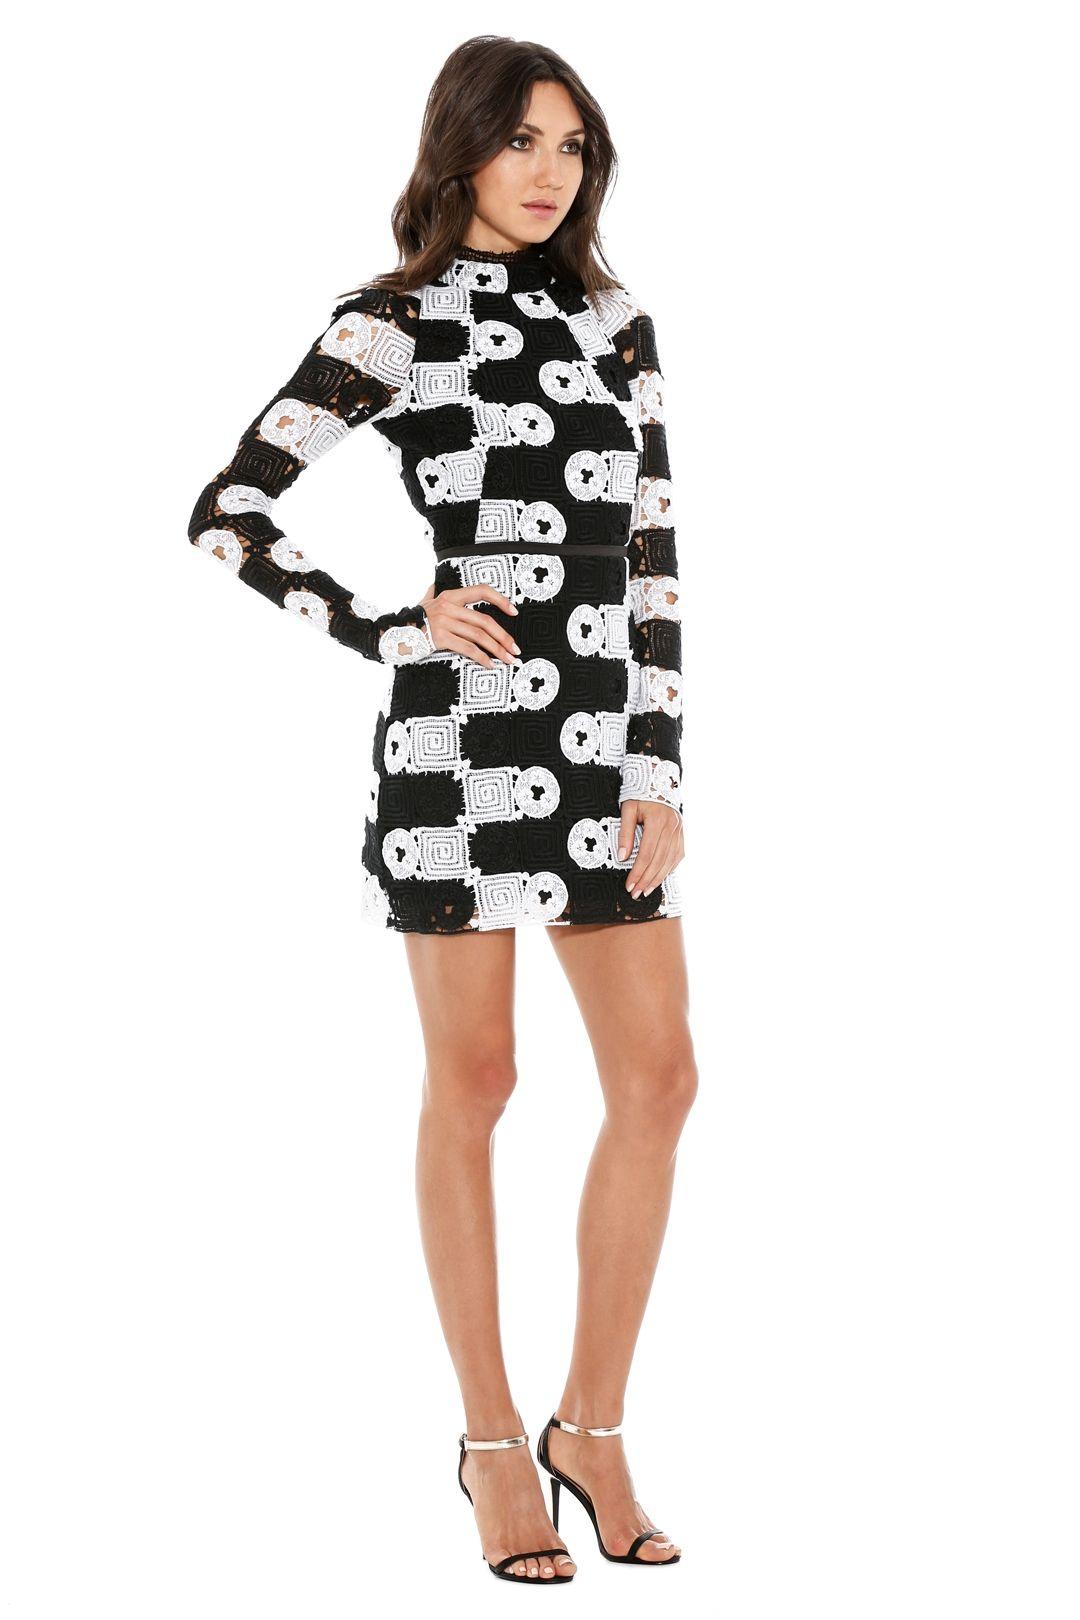 Manning Cartell - Split Personality Dress - Back White - Side